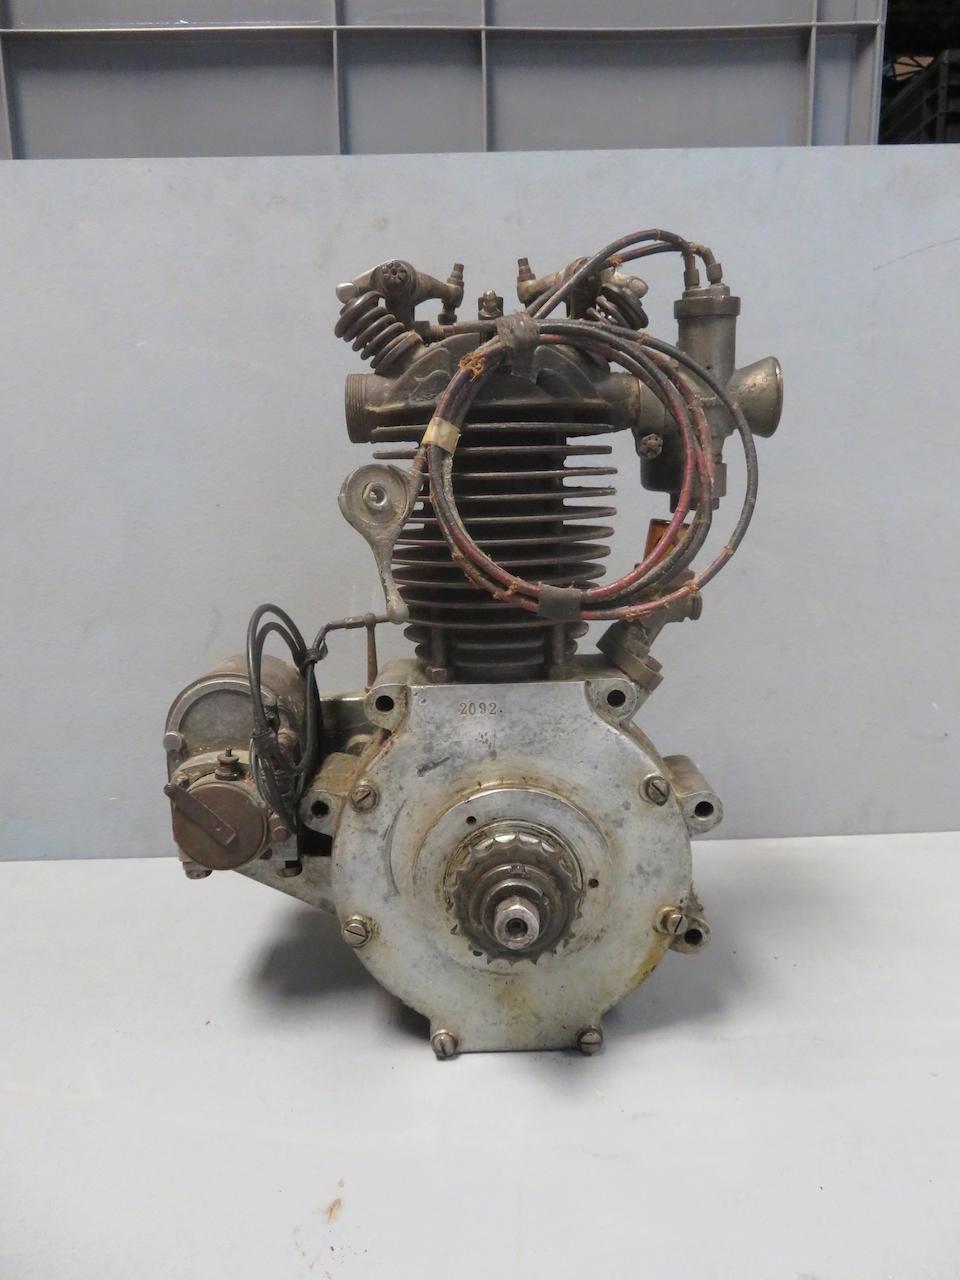 A believed Küchen ohv single-cylinder engine